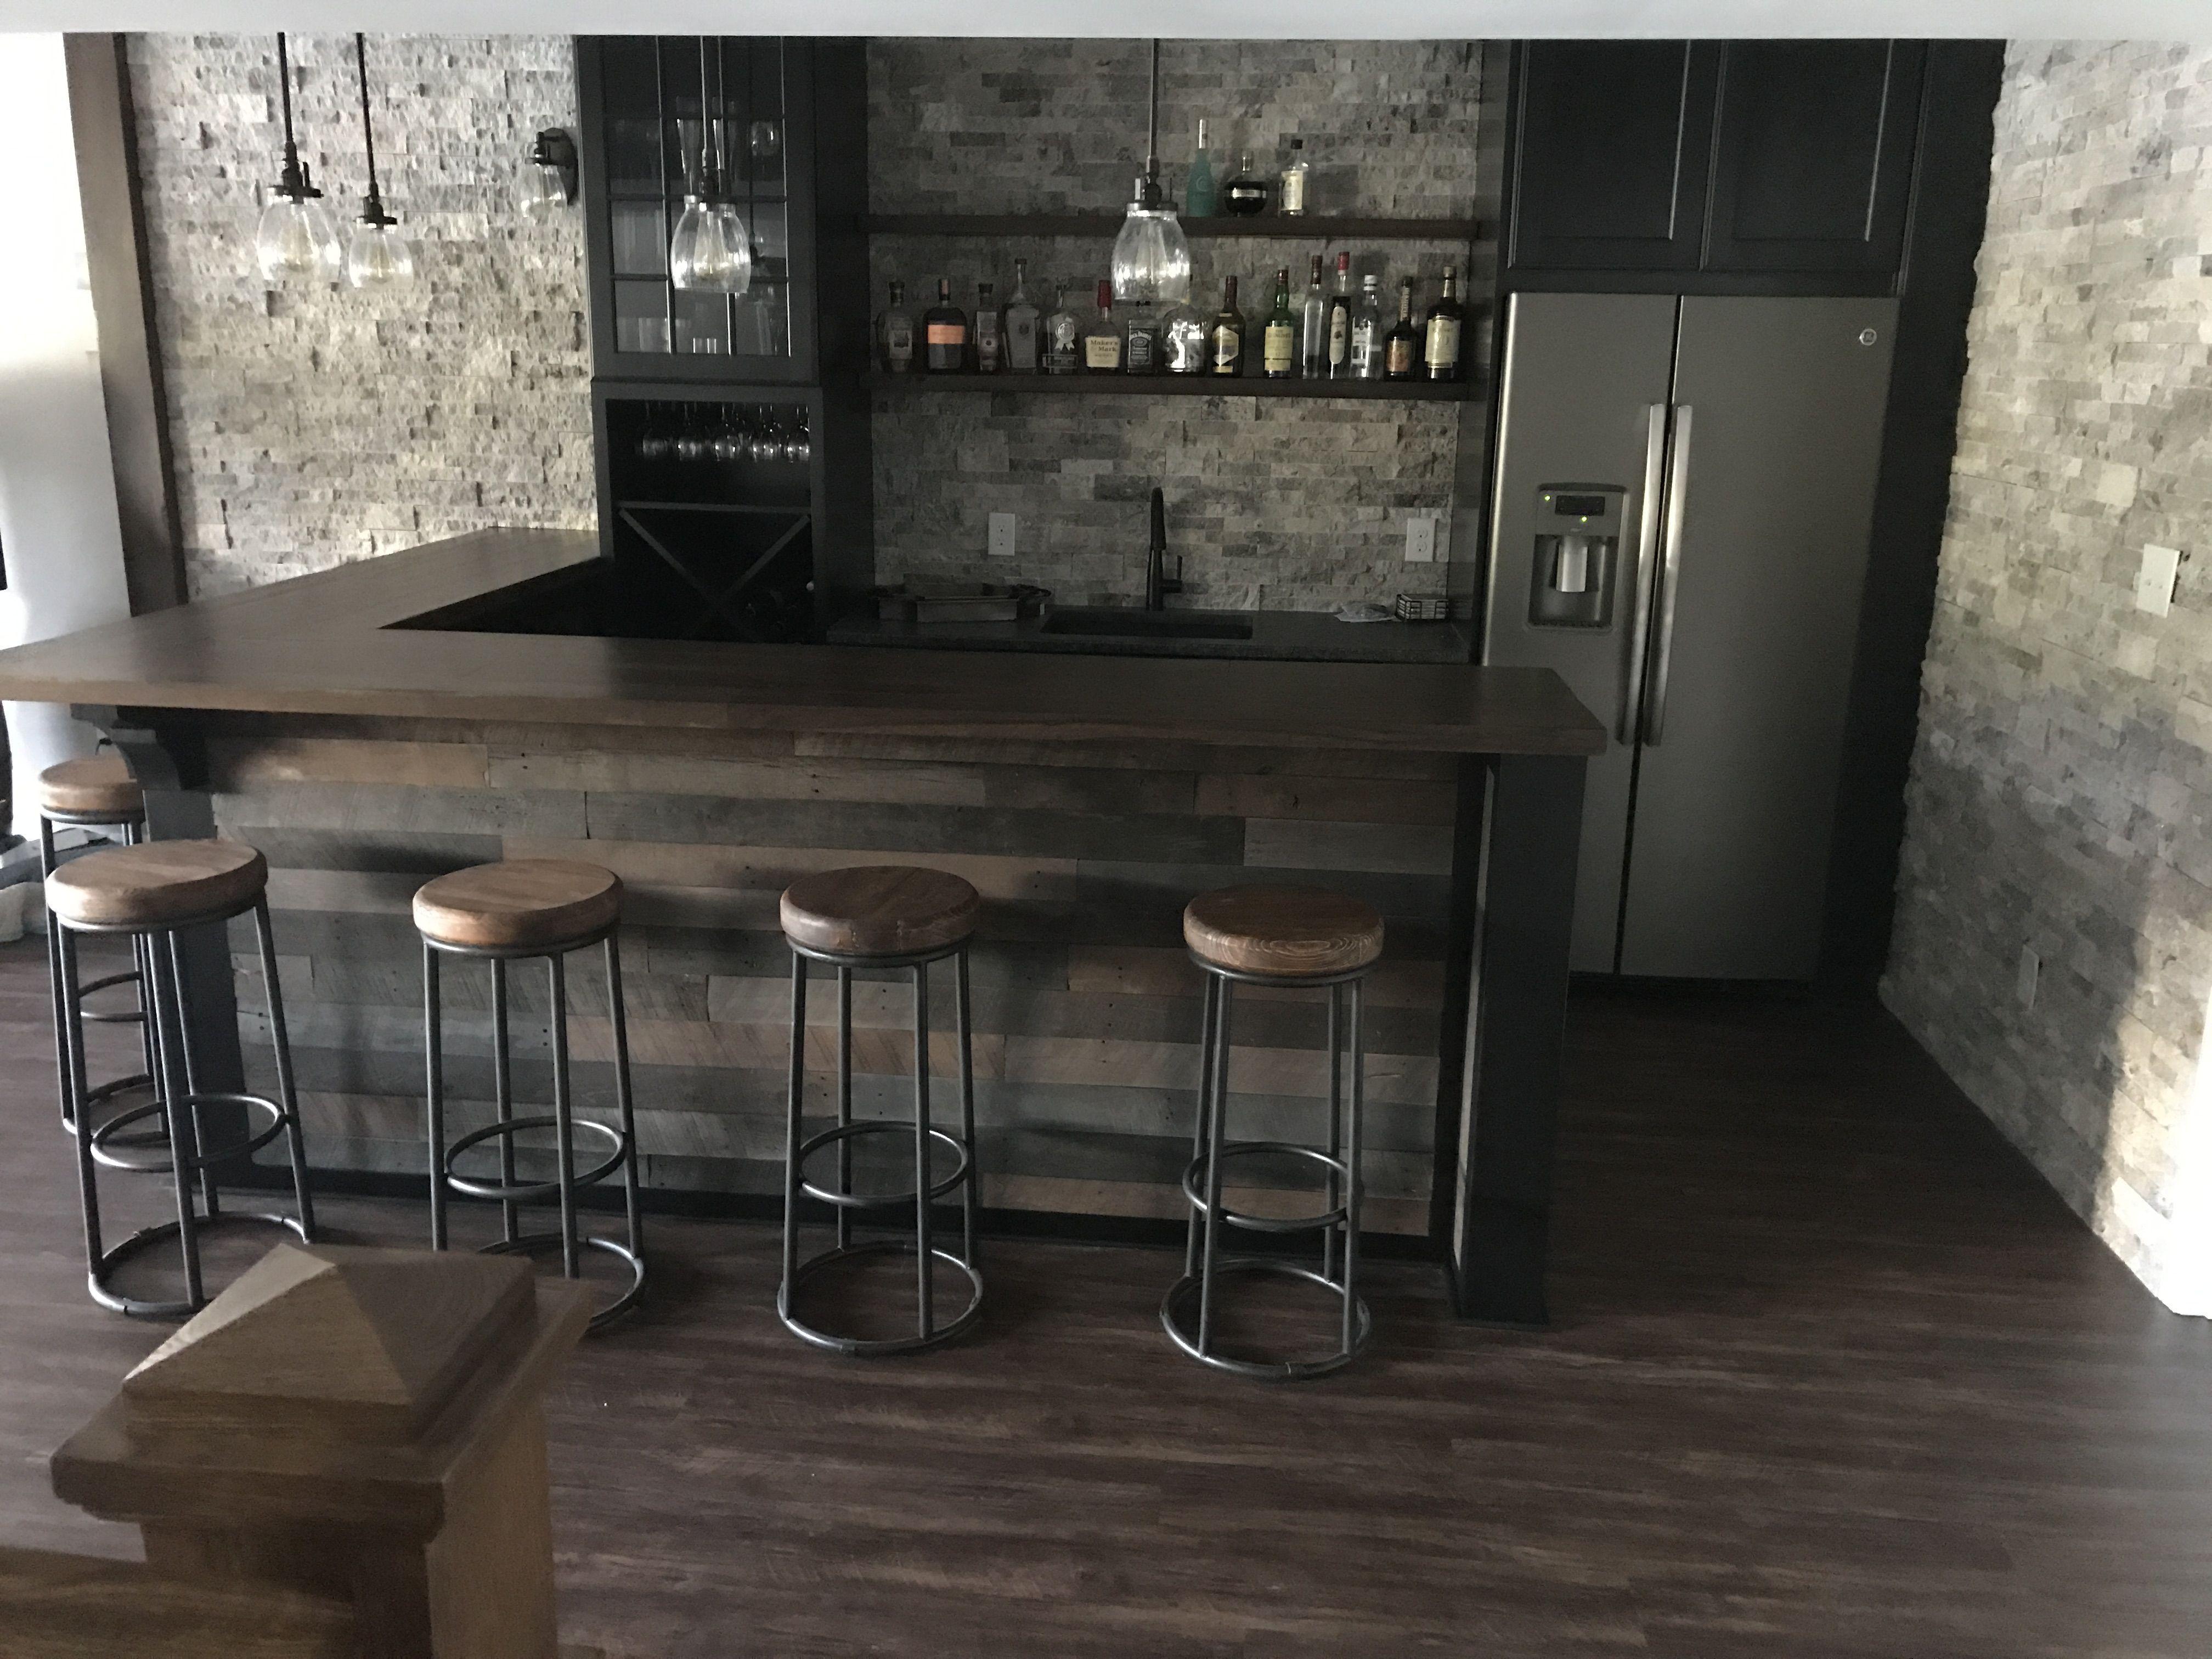 20 Insanely Cool Basement Bar Ideas For Your Home Basement Bar